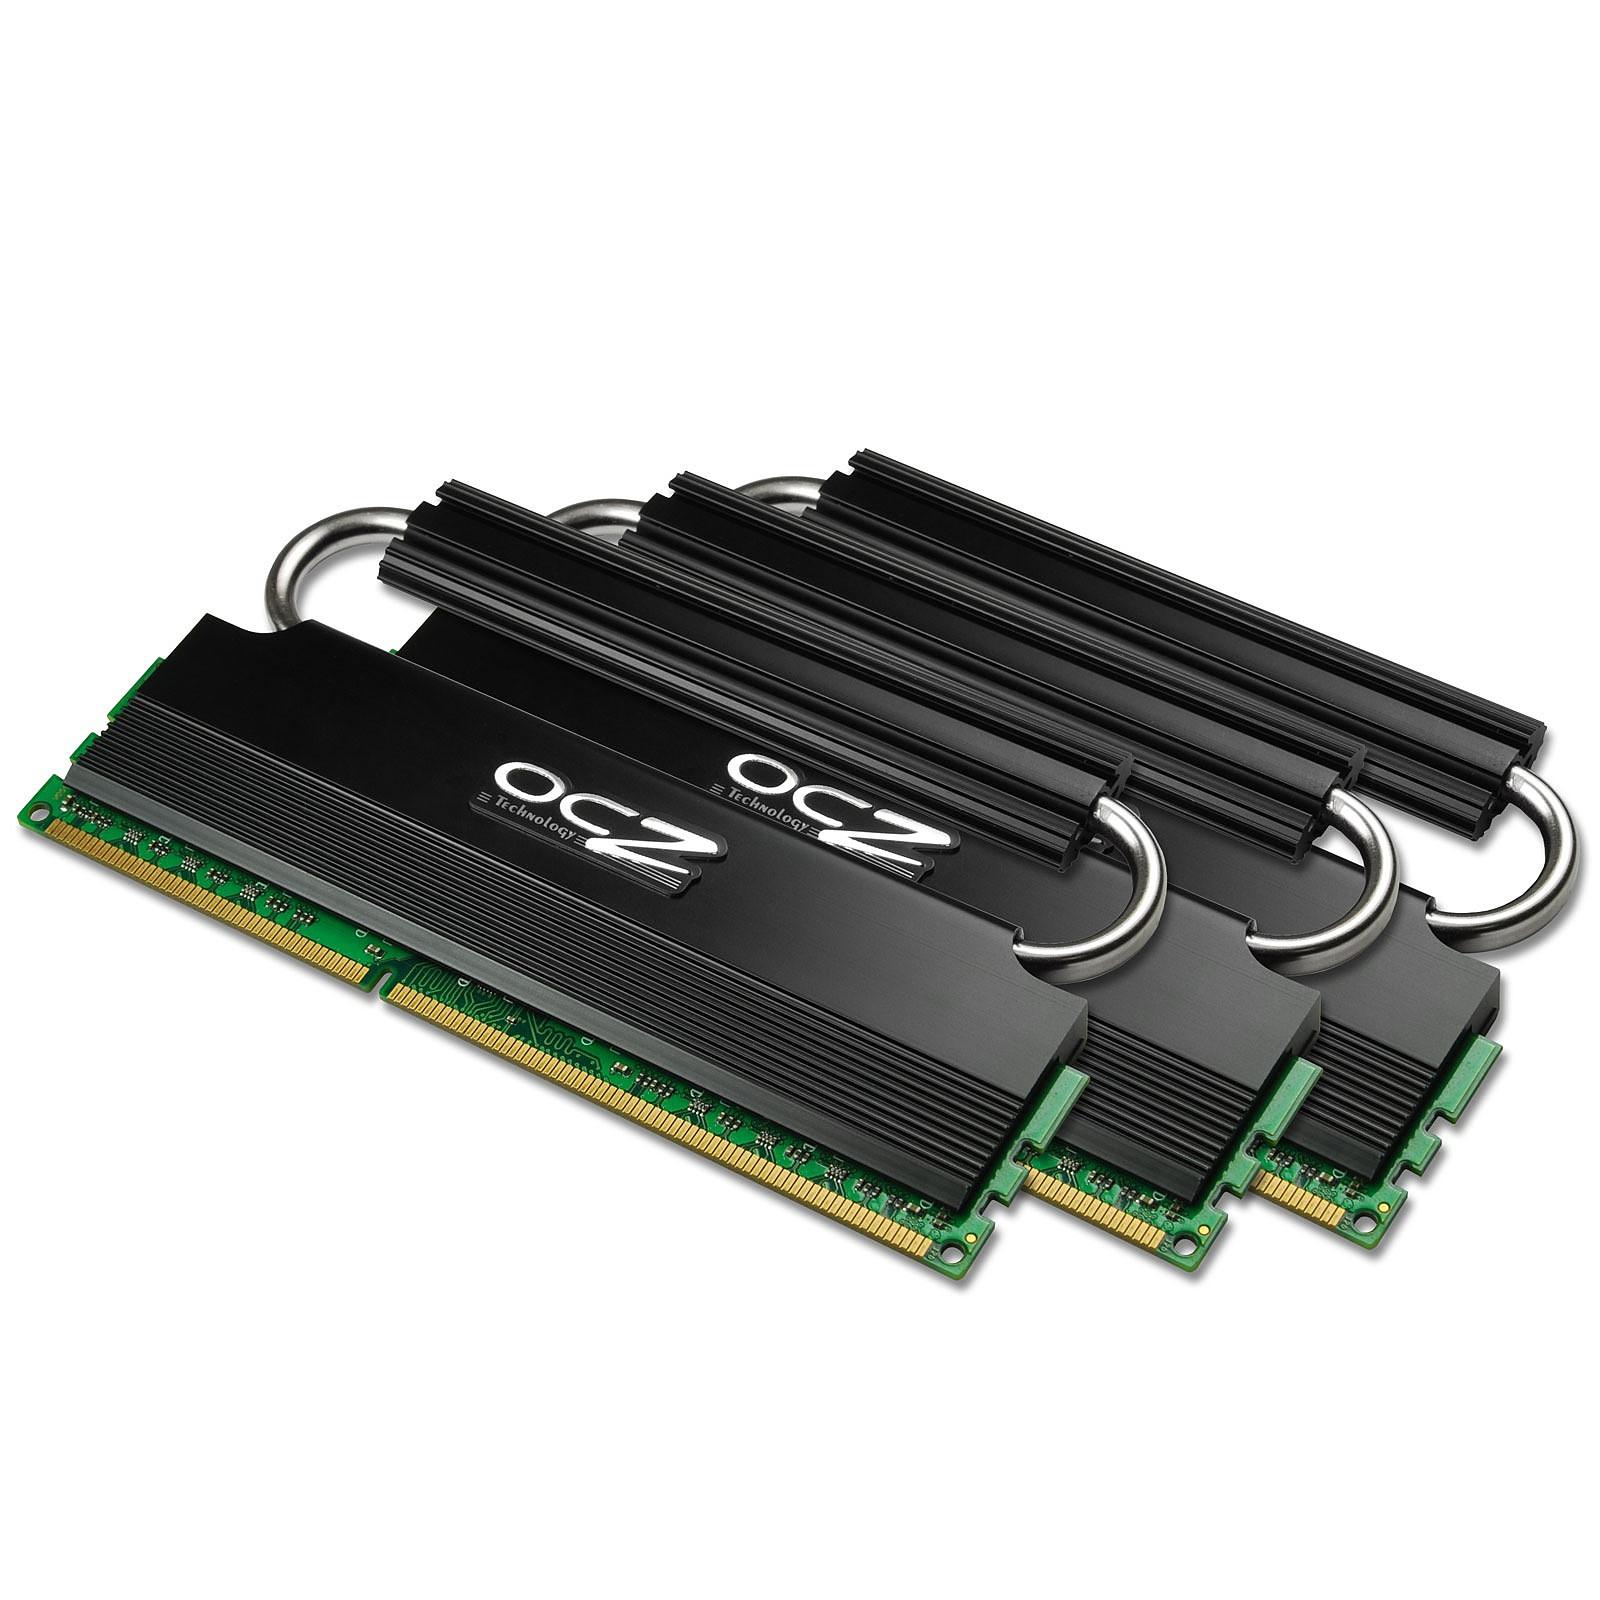 OCZ Reaper HPC 12 Go (3x 4Go) DDR3 1600 MHz